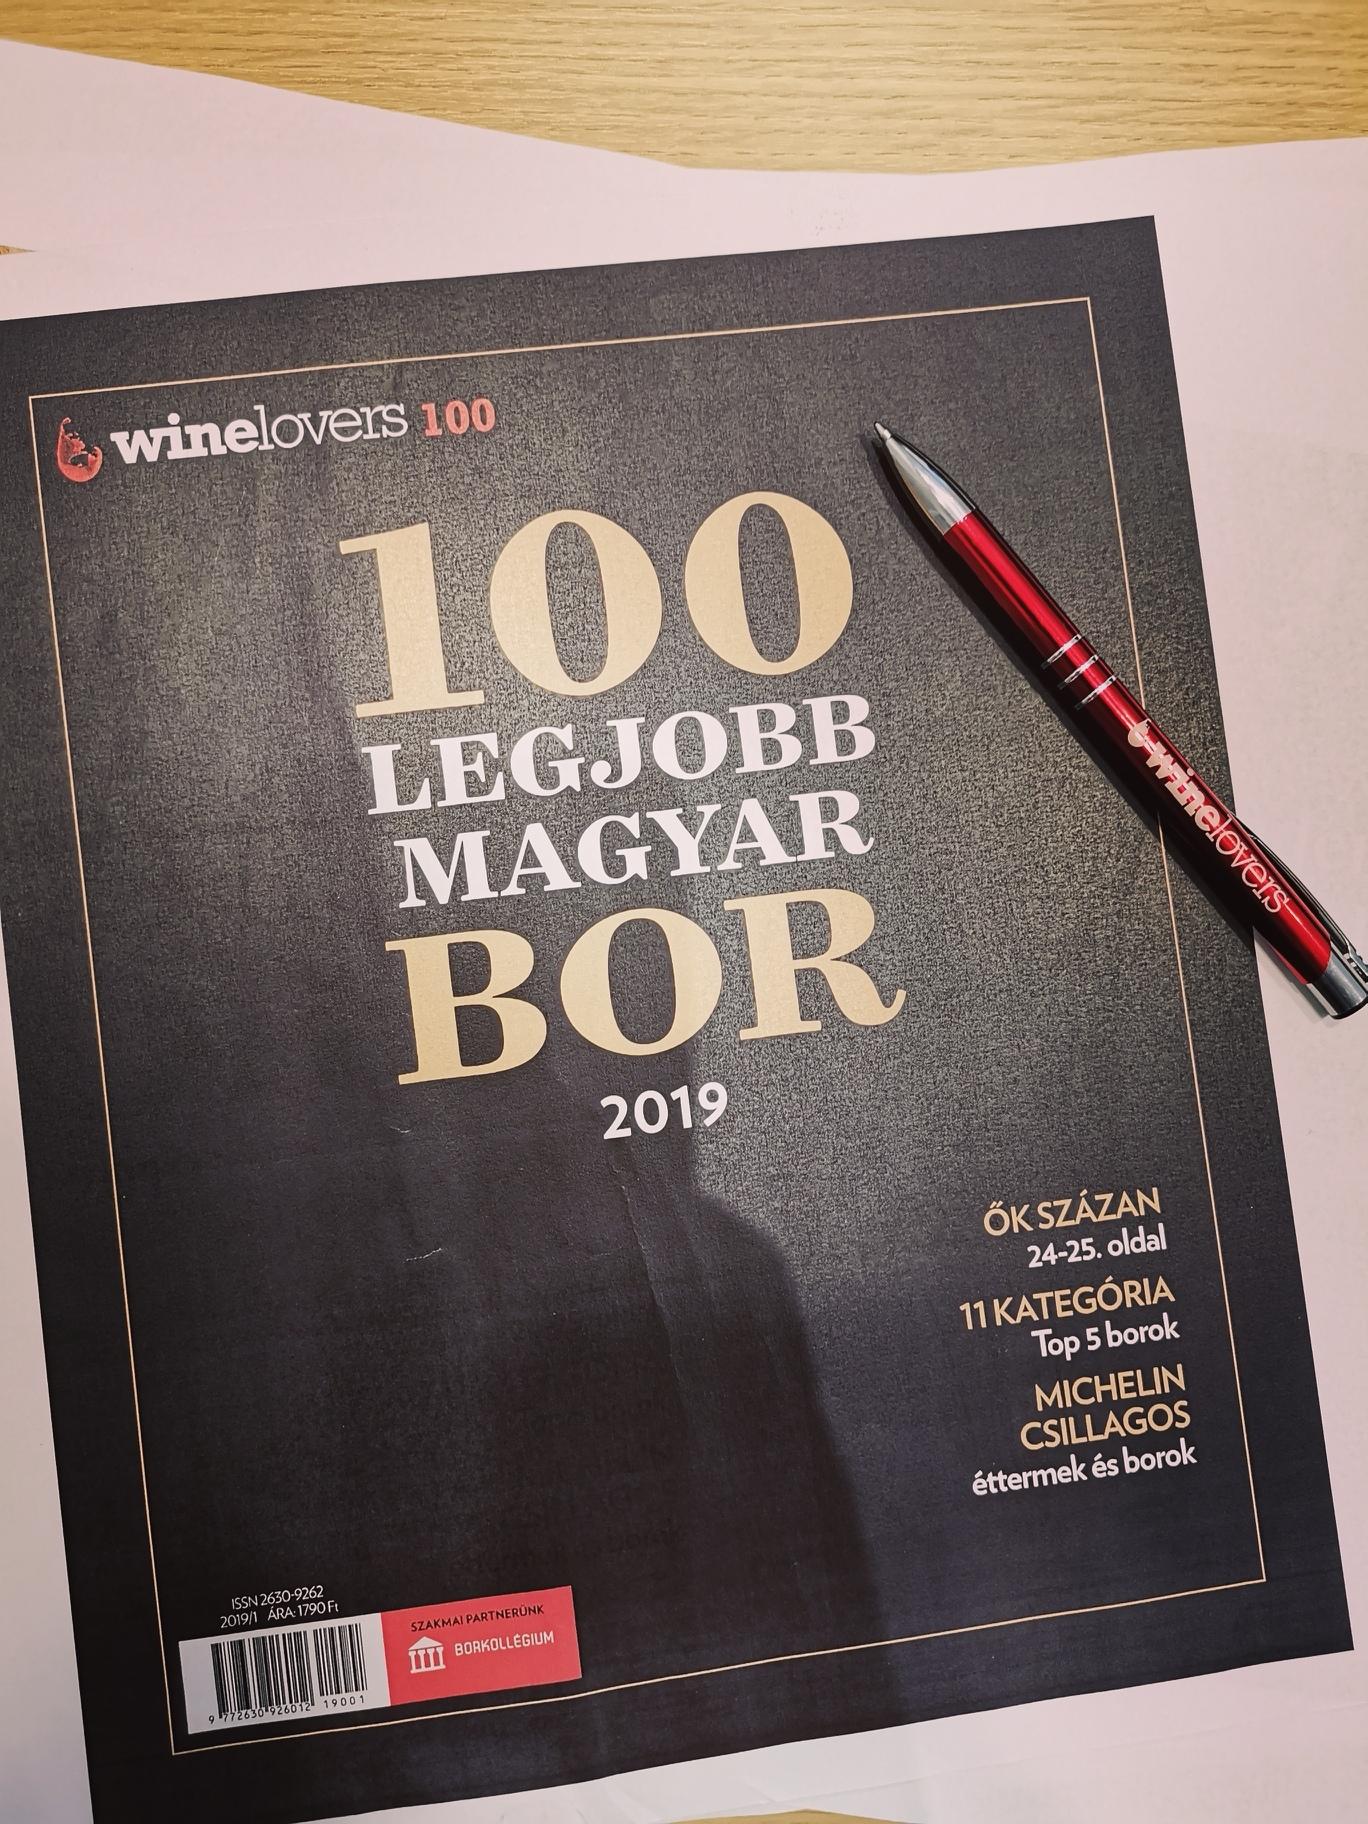 wl100-cover.jpg